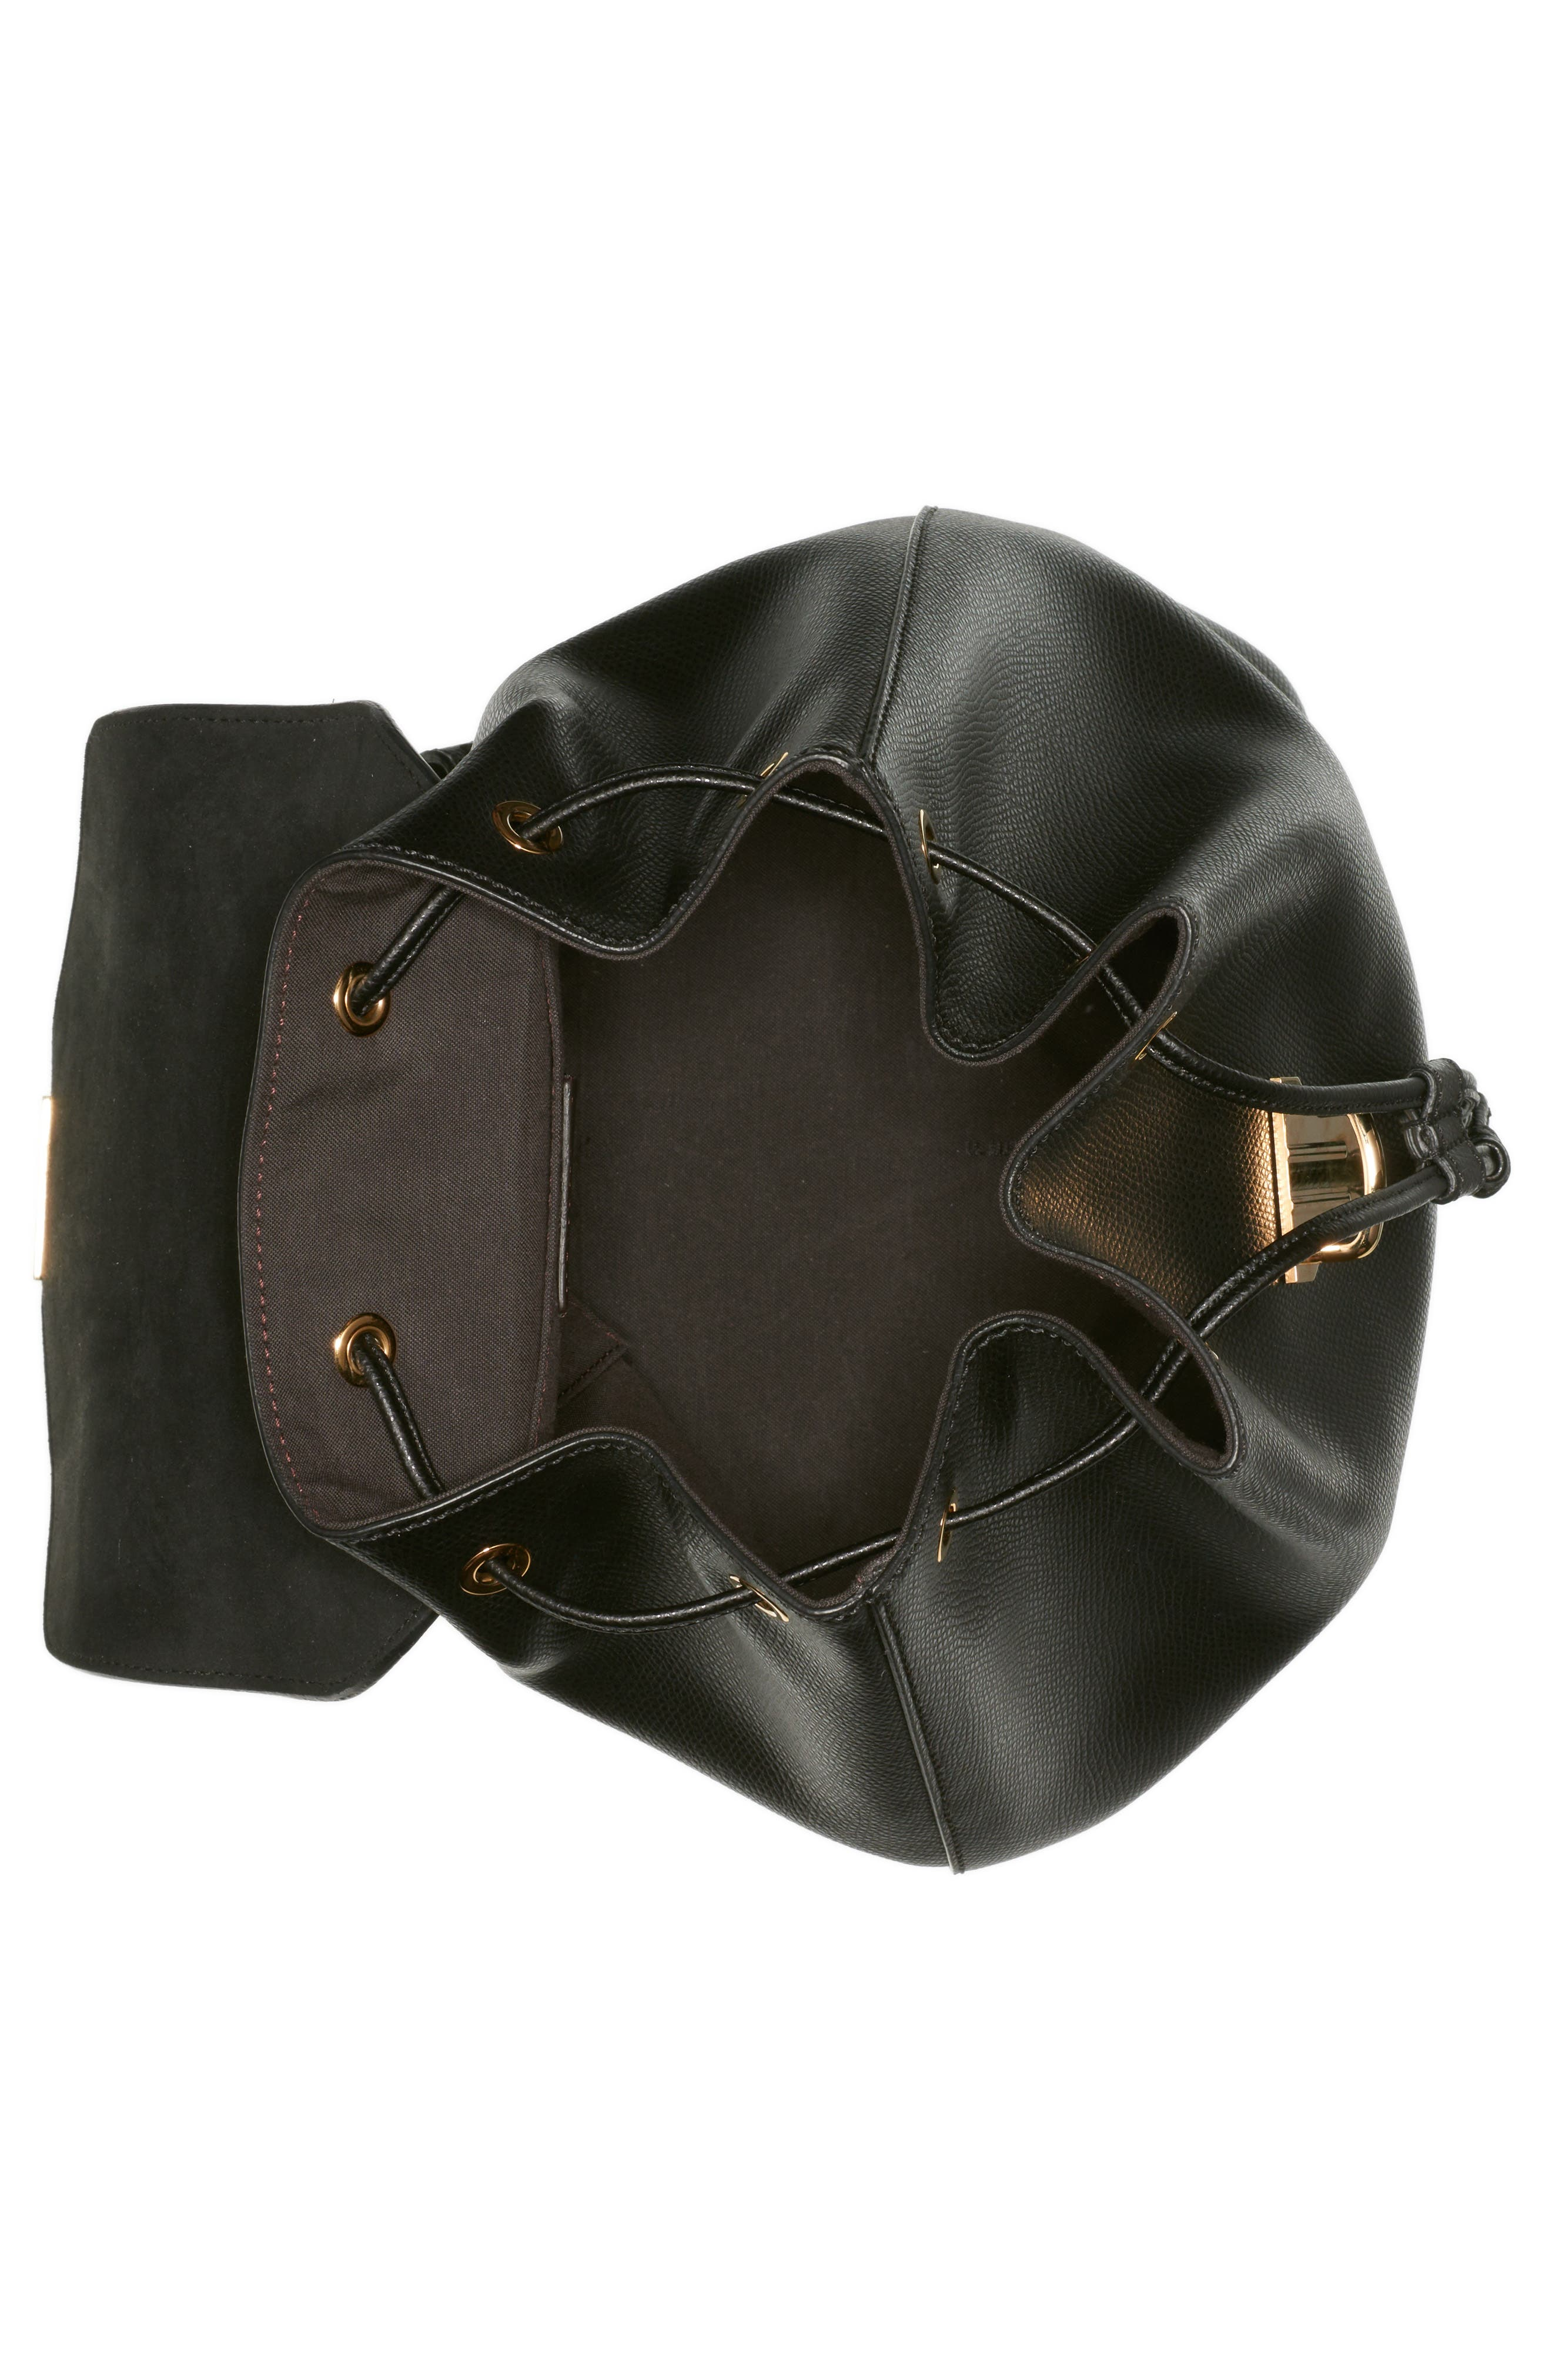 FENDI,                             Cruise Calfskin Leather Backpack,                             Alternate thumbnail 3, color,                             006